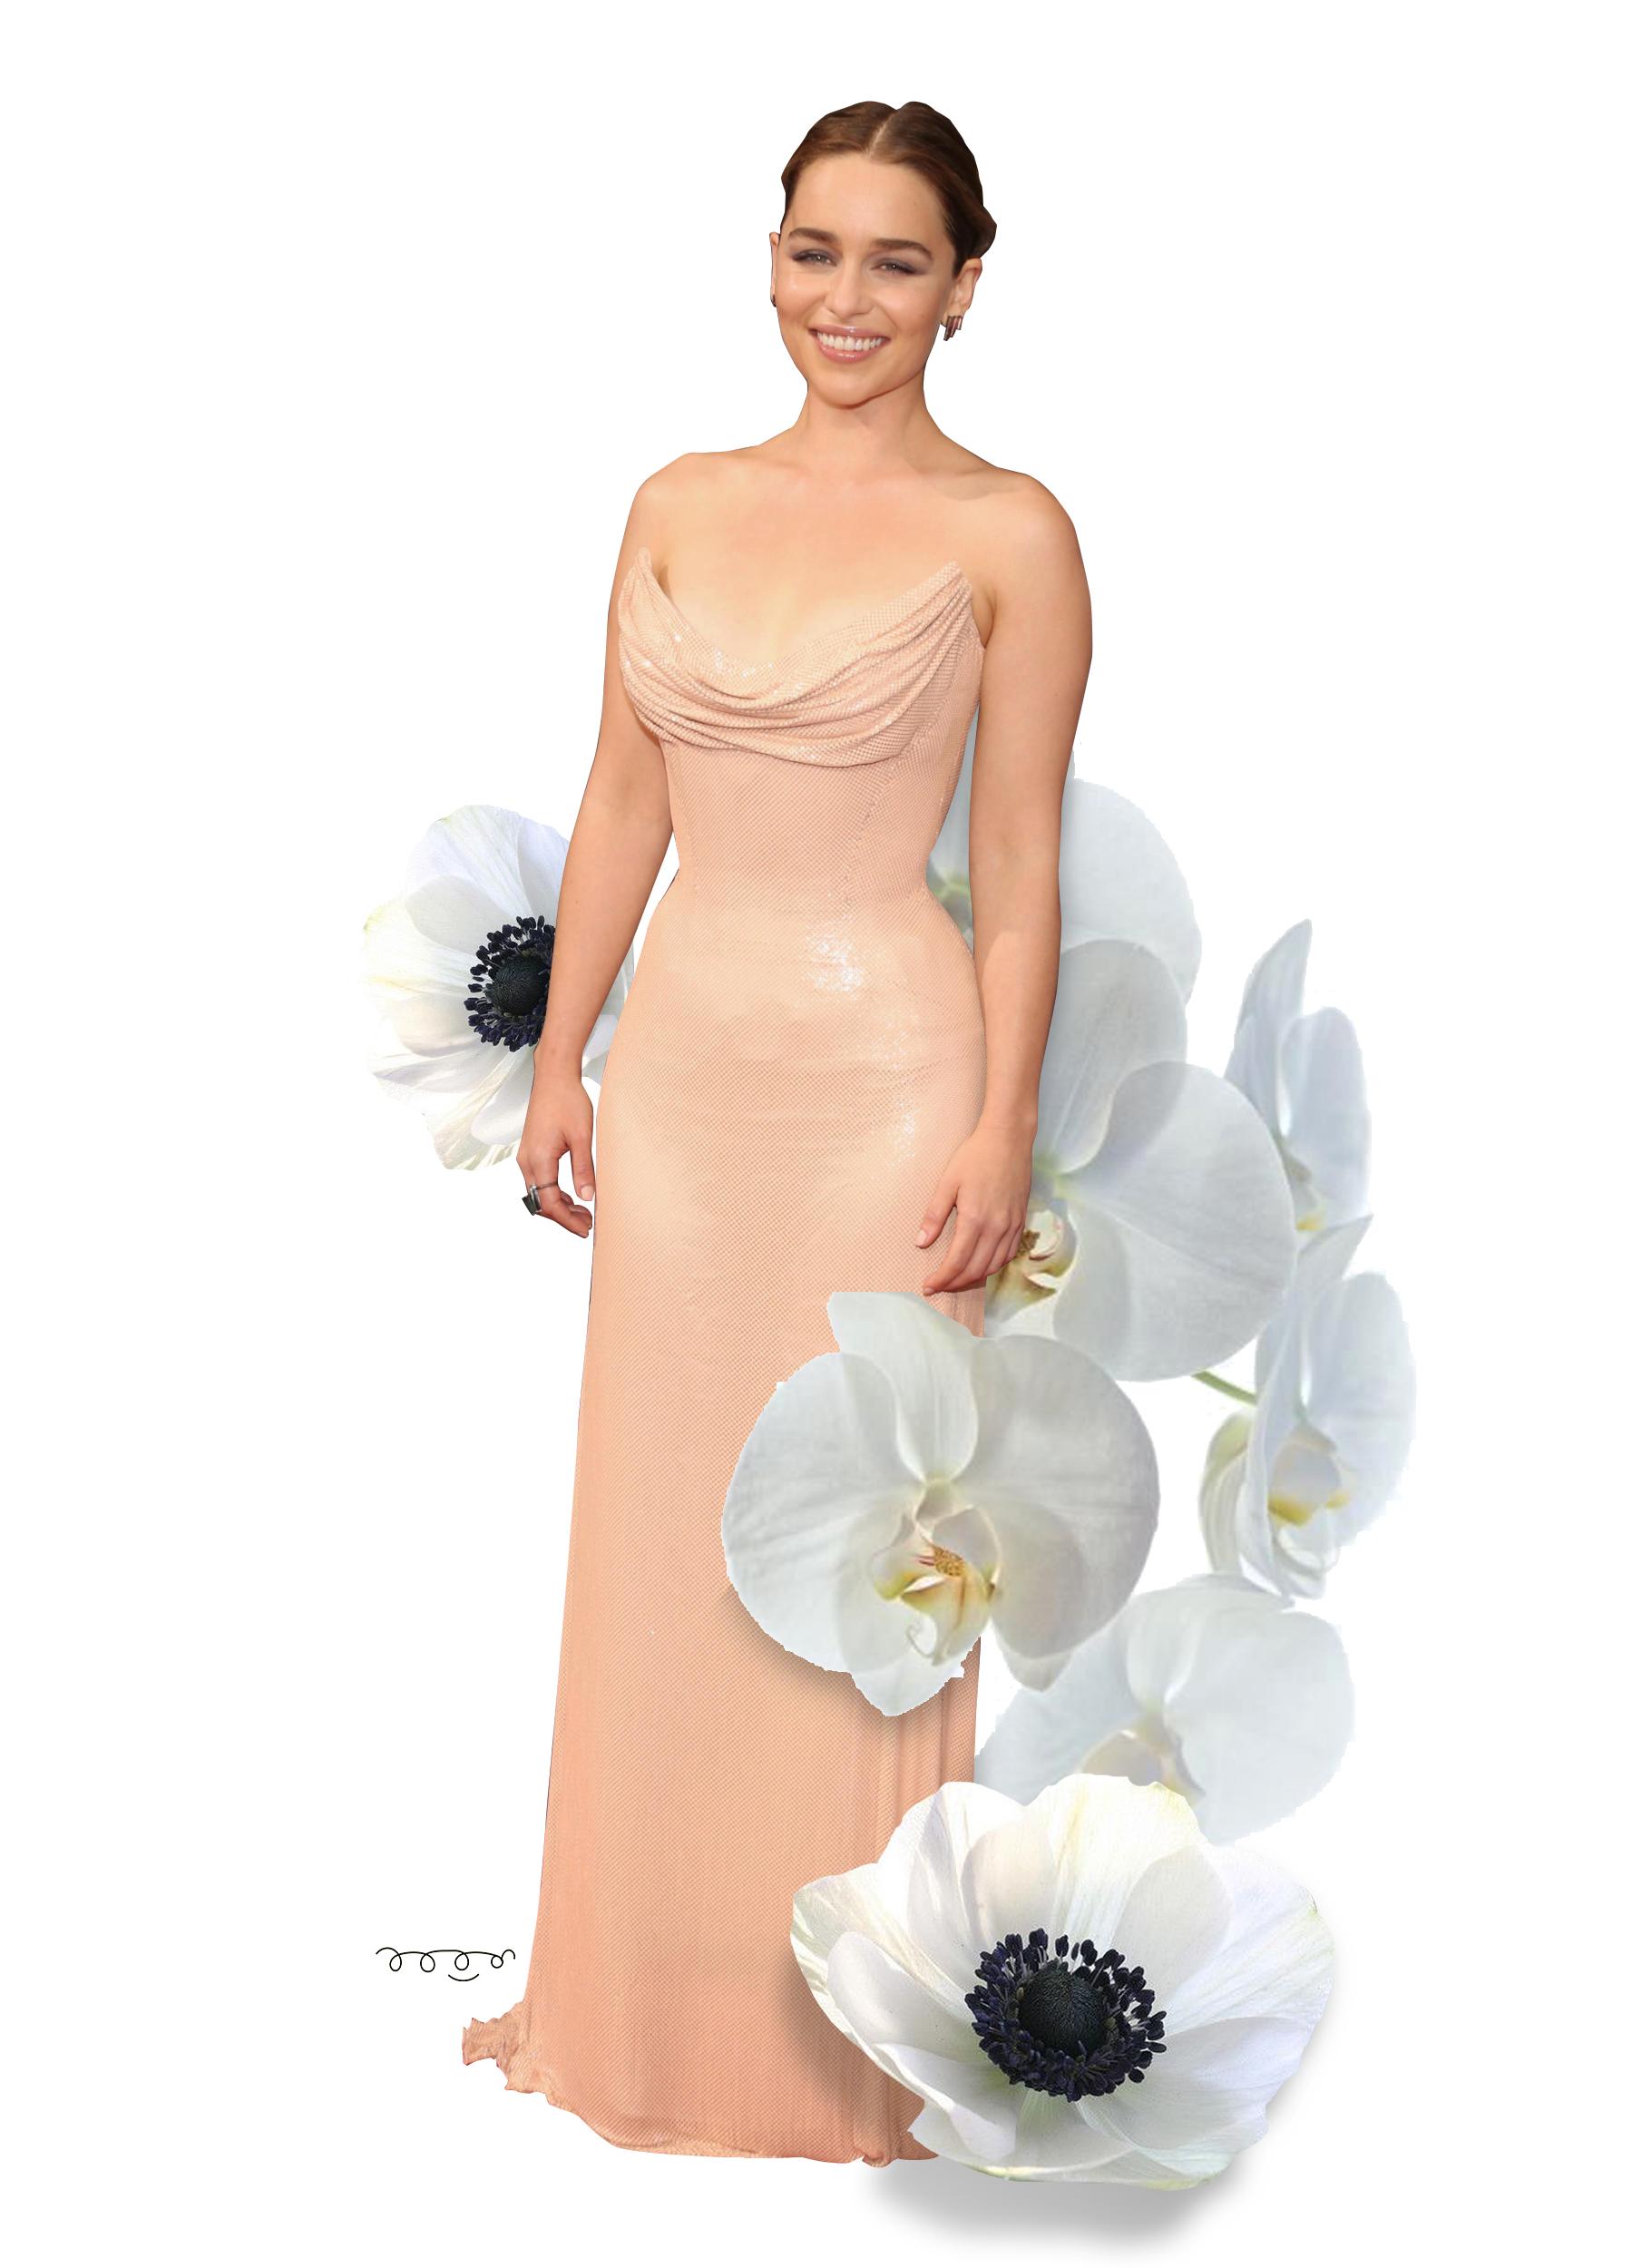 twelveofour.com | Emilia Clark, Atelier Versace